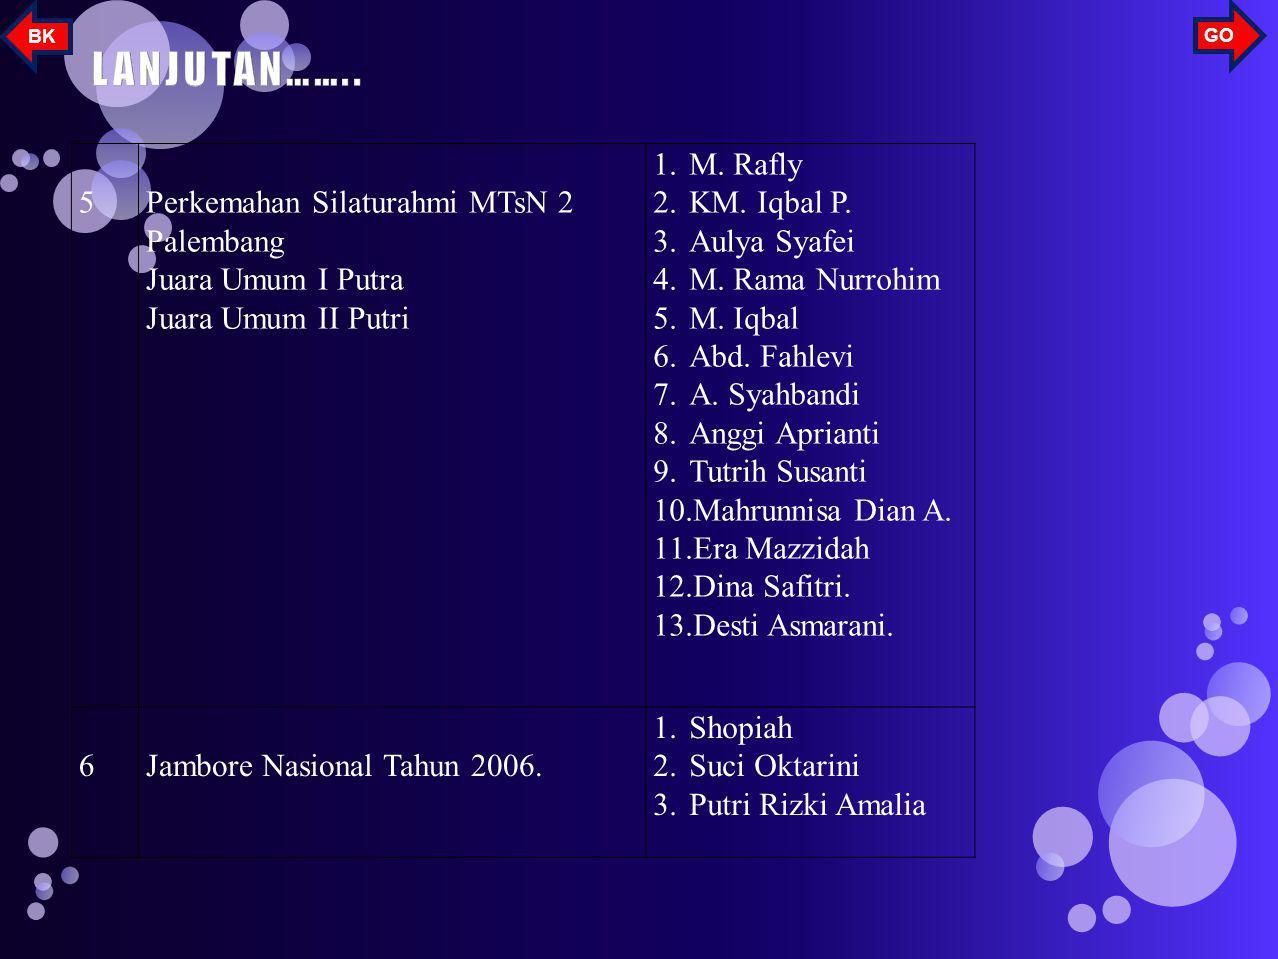 LANJUTAN…….. 5 Perkemahan Silaturahmi MTsN 2 Palembang